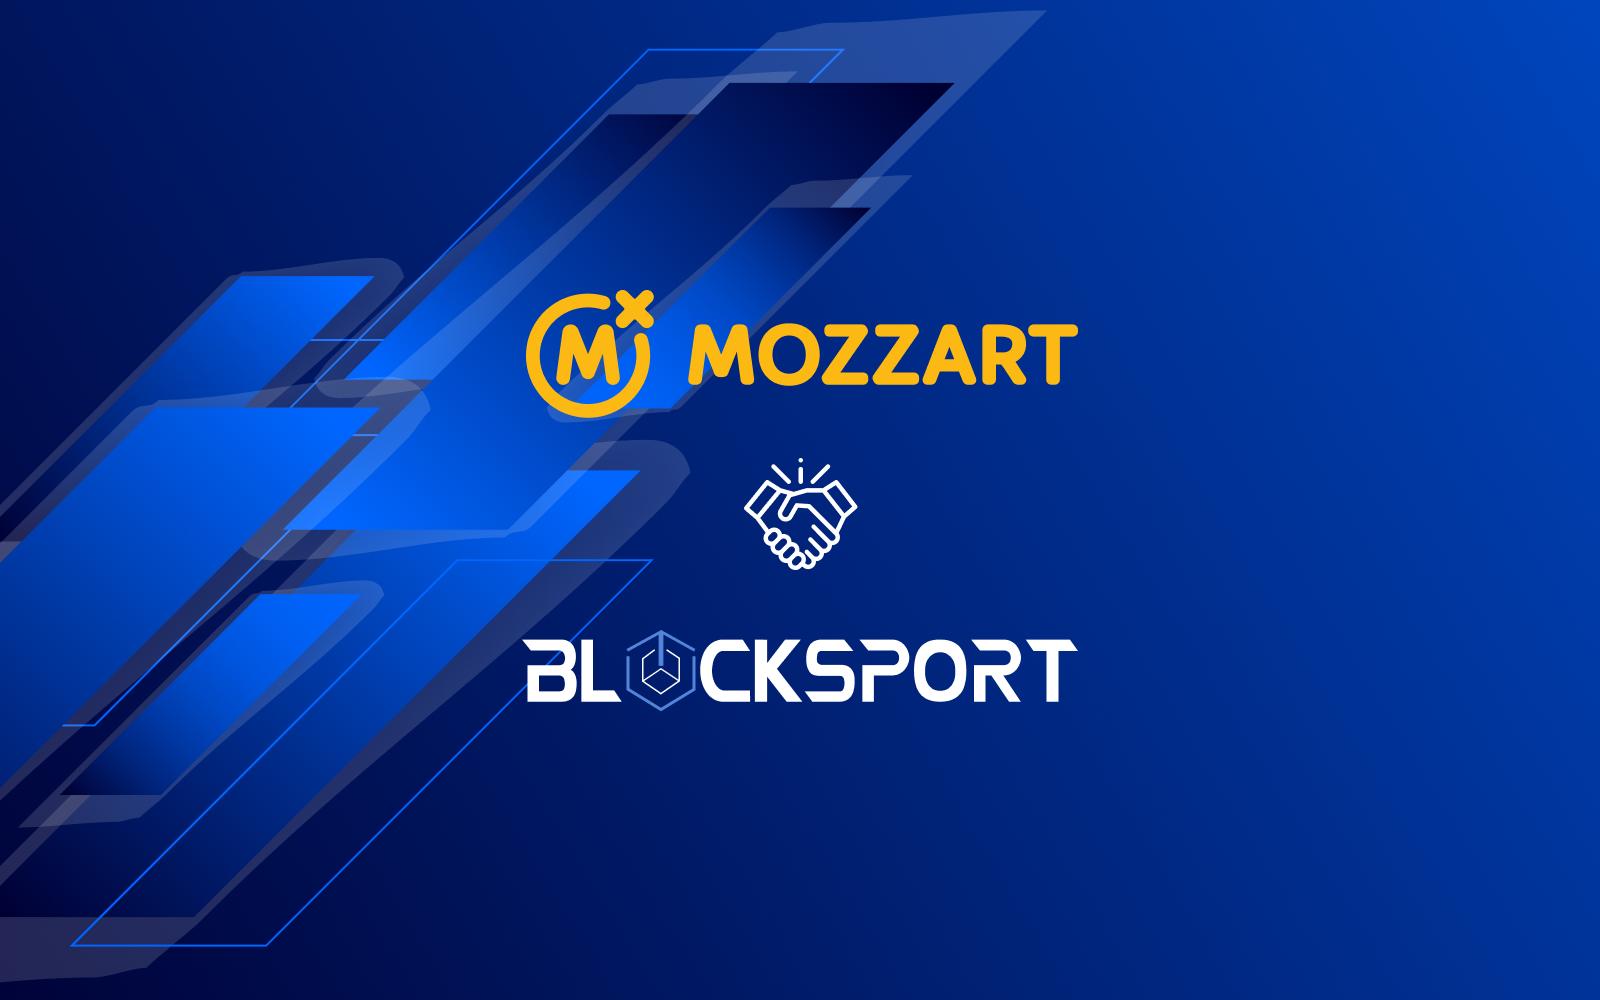 Partnership with Mozzart